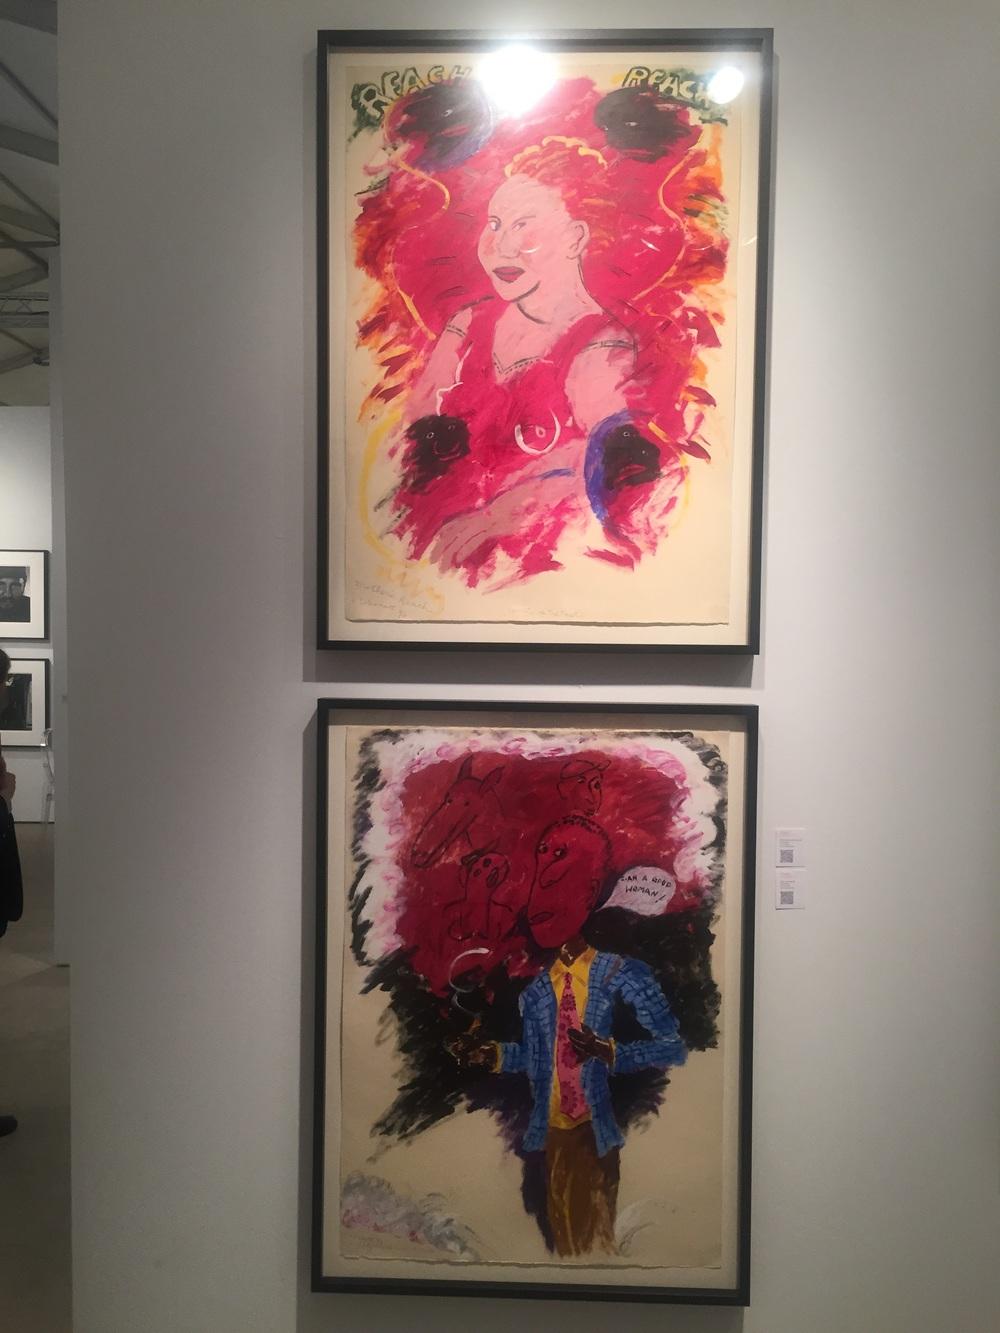 Robert Colescott - Arthur Roger Gallery, Art Miami